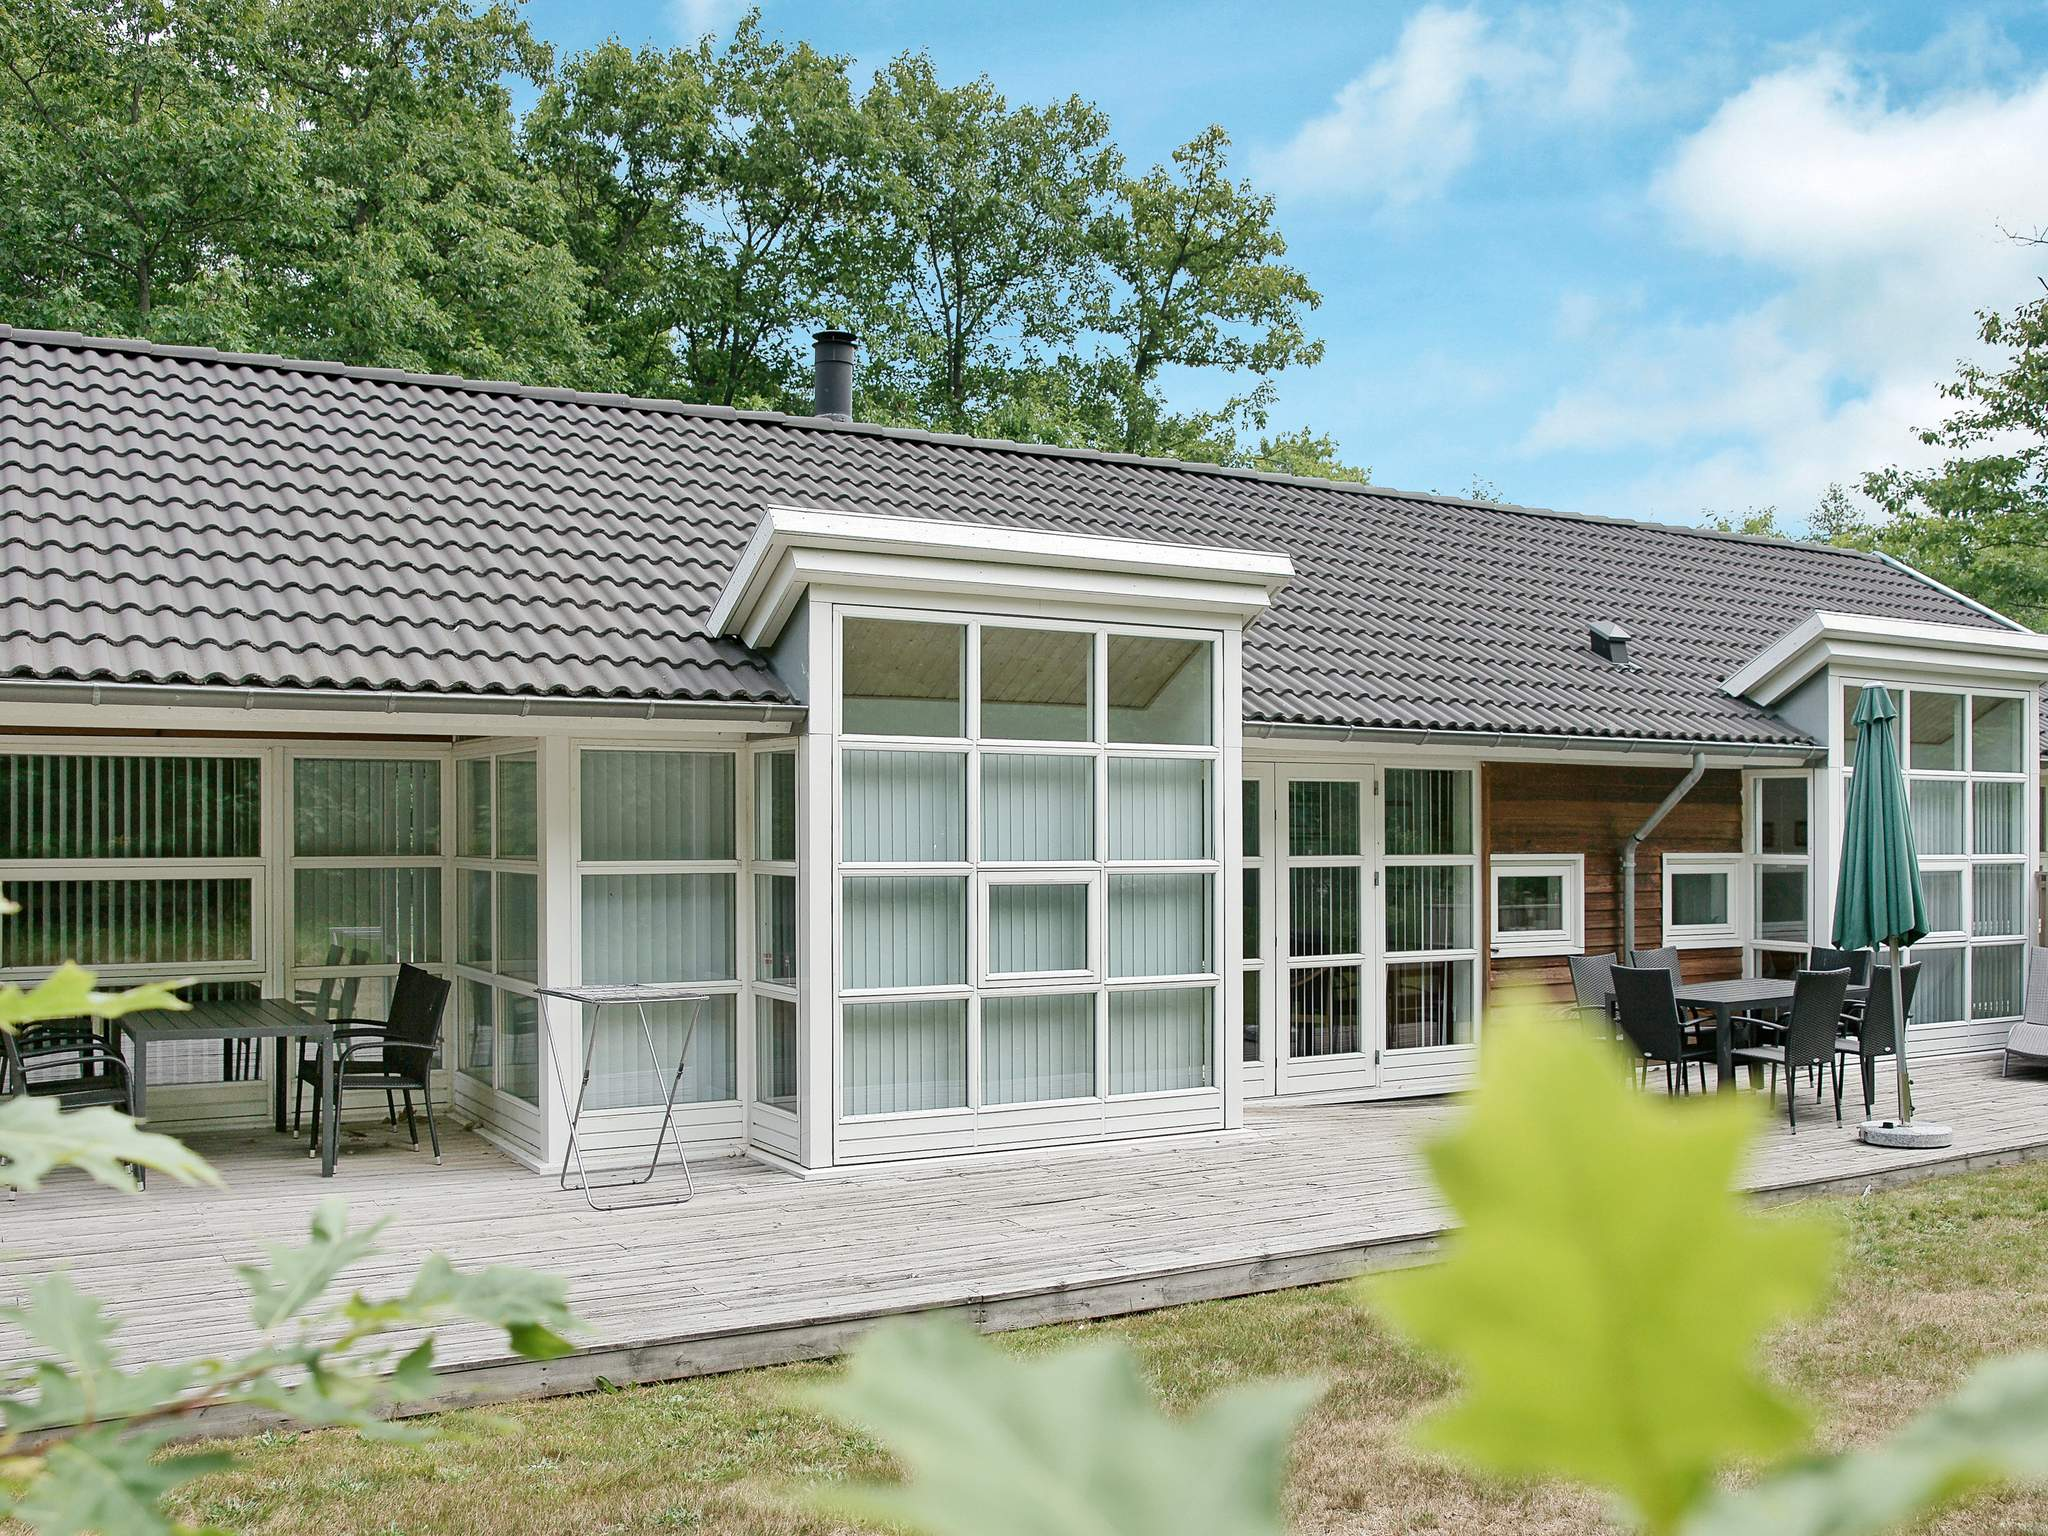 Ferienhaus Hasle (493413), Hasle, , Bornholm, Dänemark, Bild 18